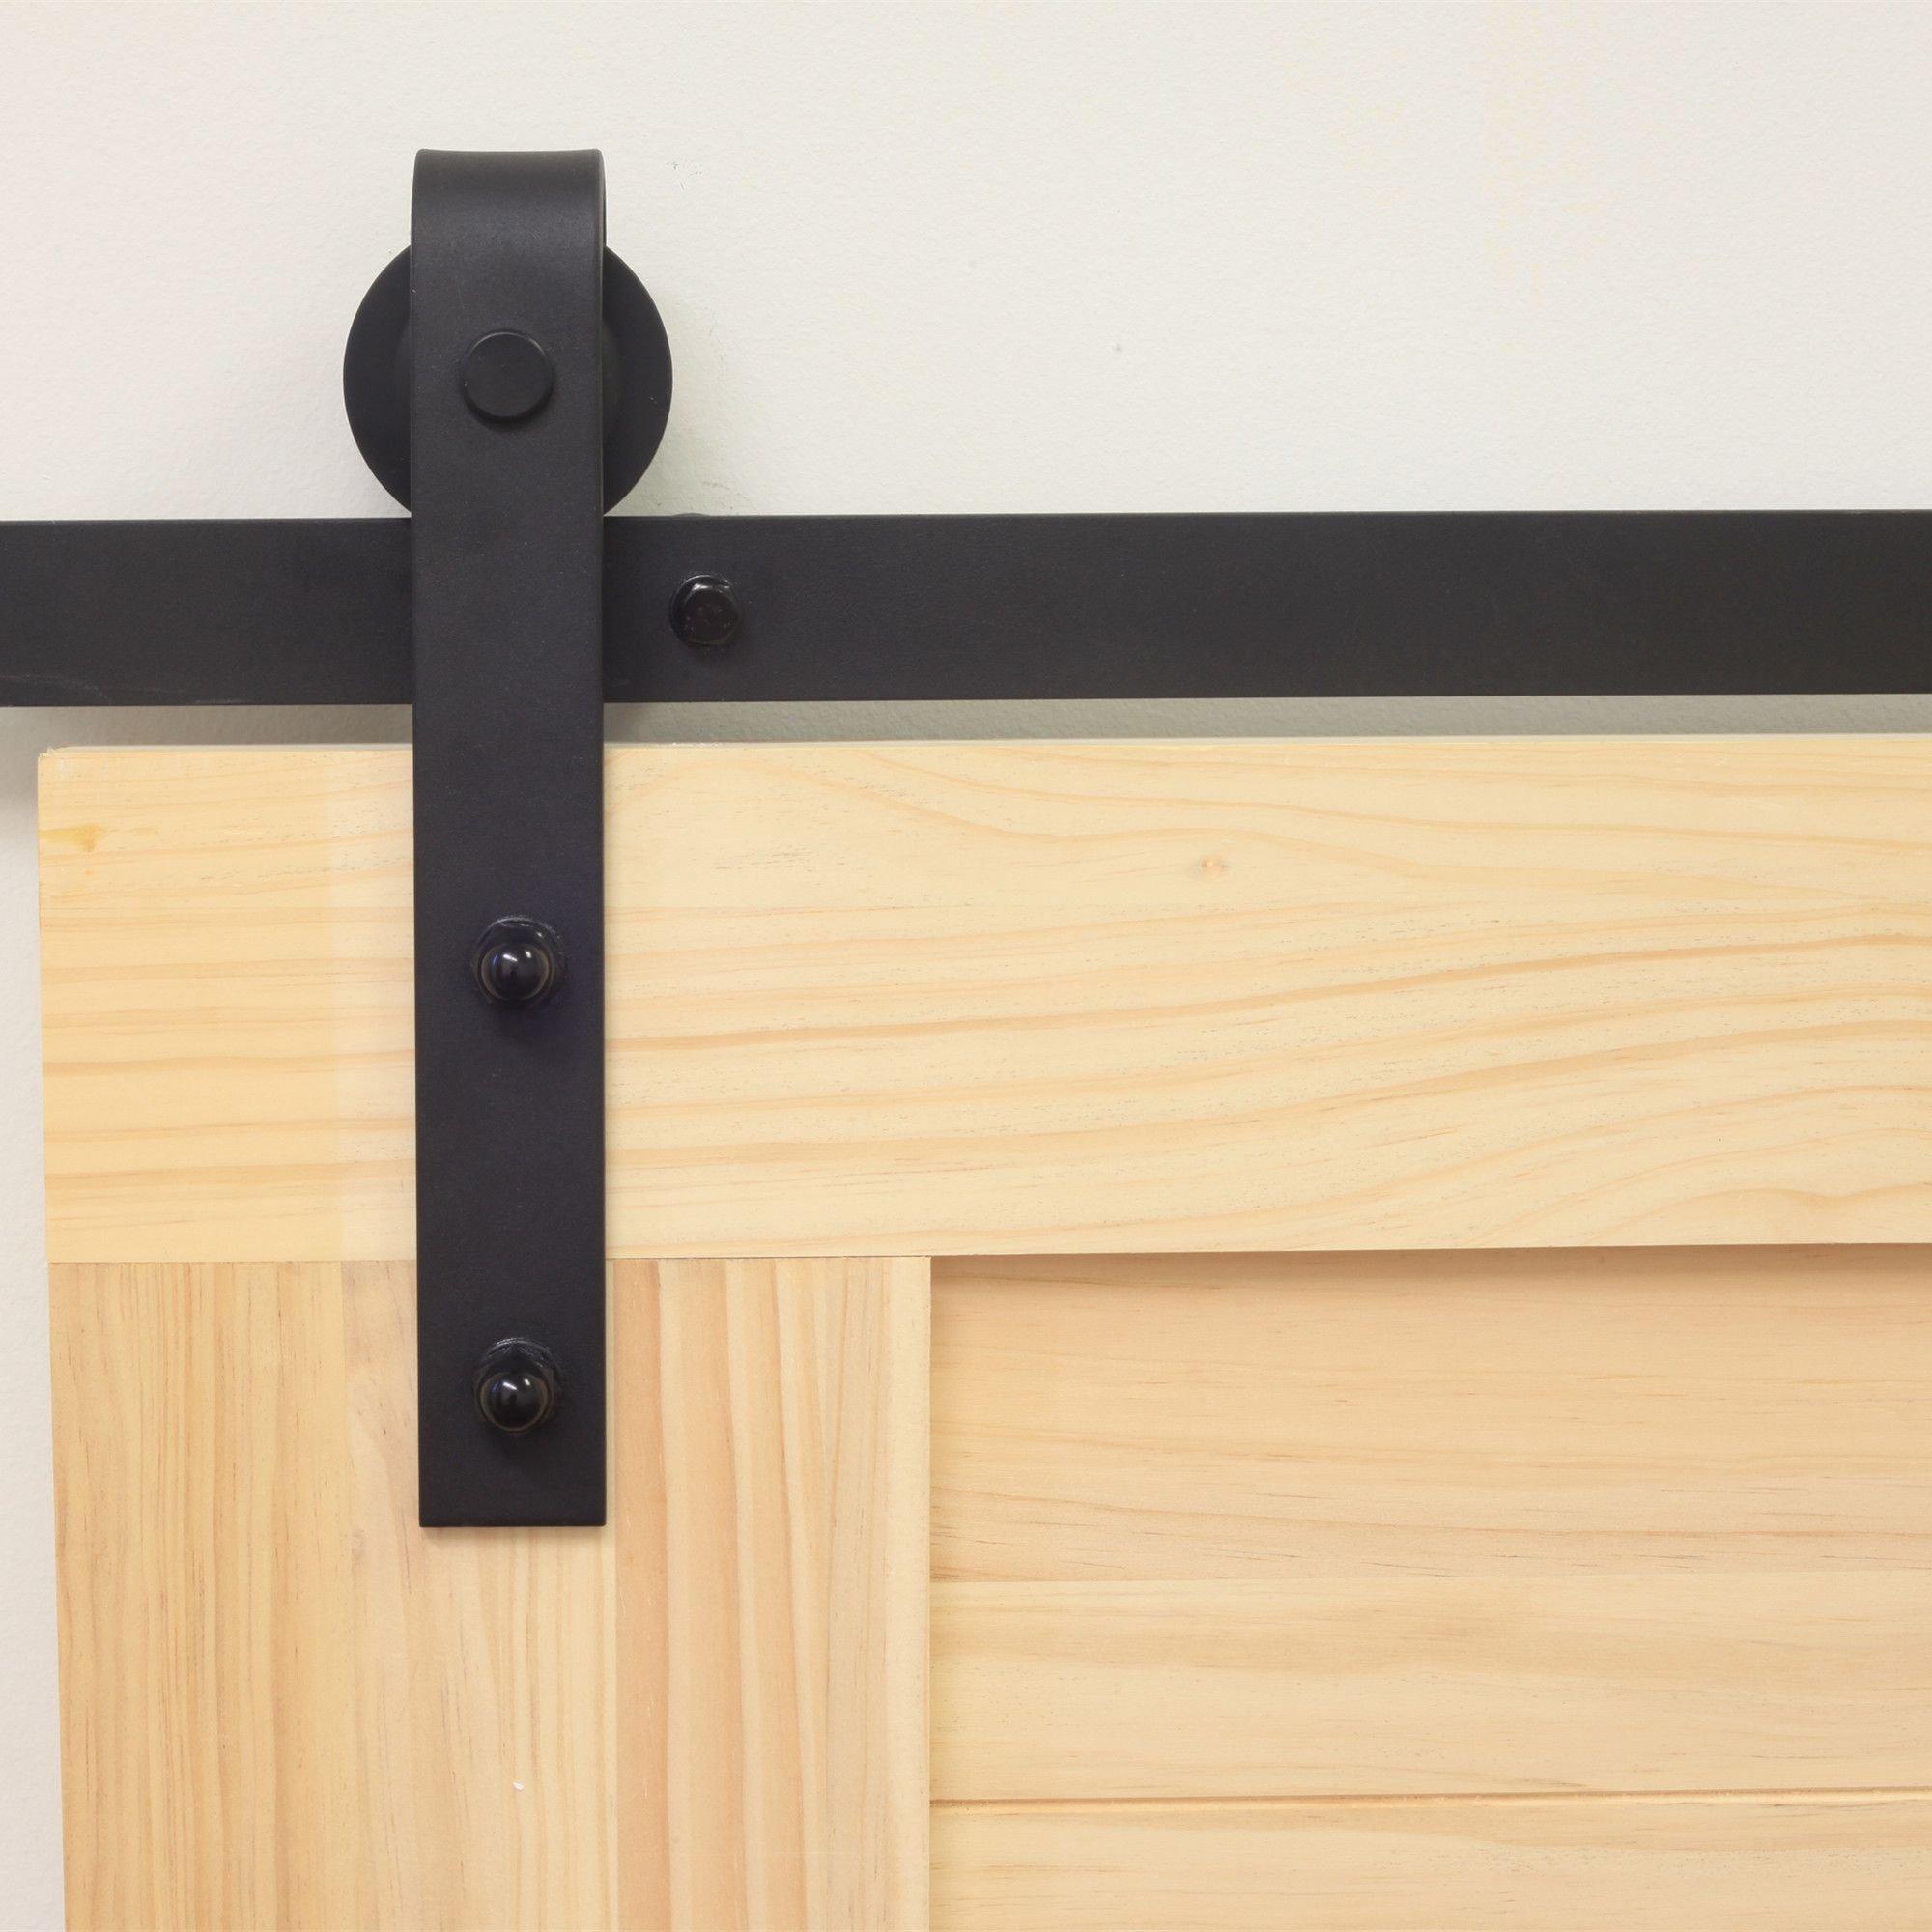 Homacer Sliding Barn Door Hardware Single Track Bypass Double Door Kit, 7.5FT Flat Track Classic Design Roller, Black Rustic Heavy Duty Interior Exterior Use by HOMACER (Image #2)